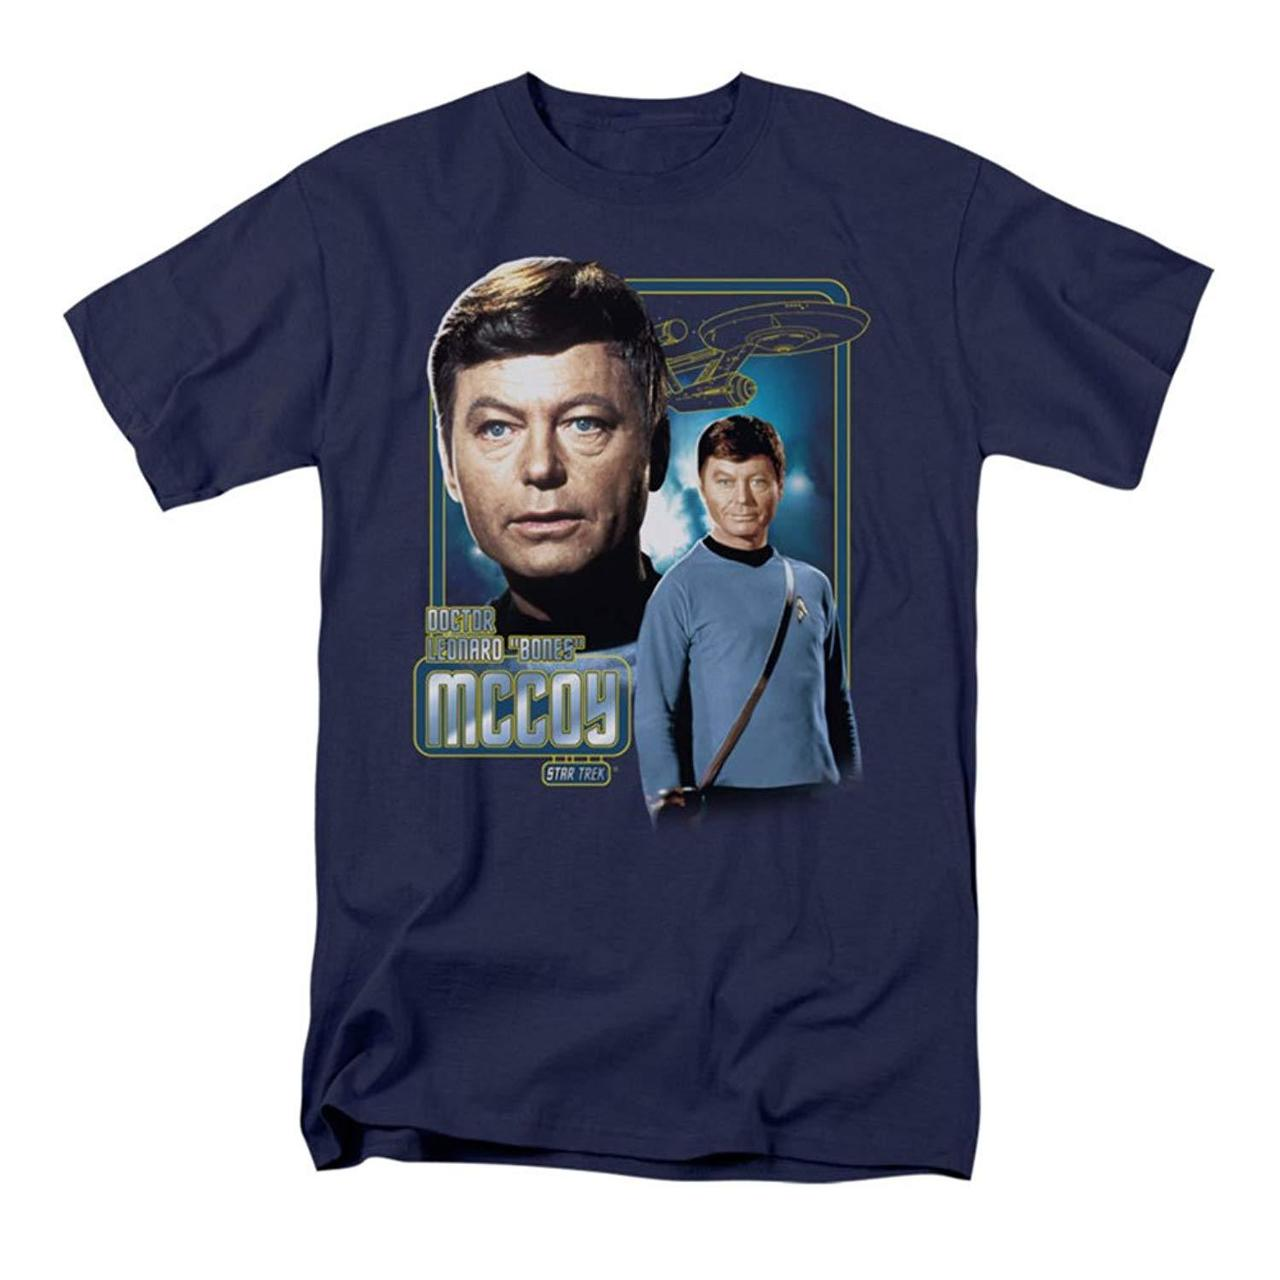 Star Trek T Shirt Doctor Mccoy Original Series